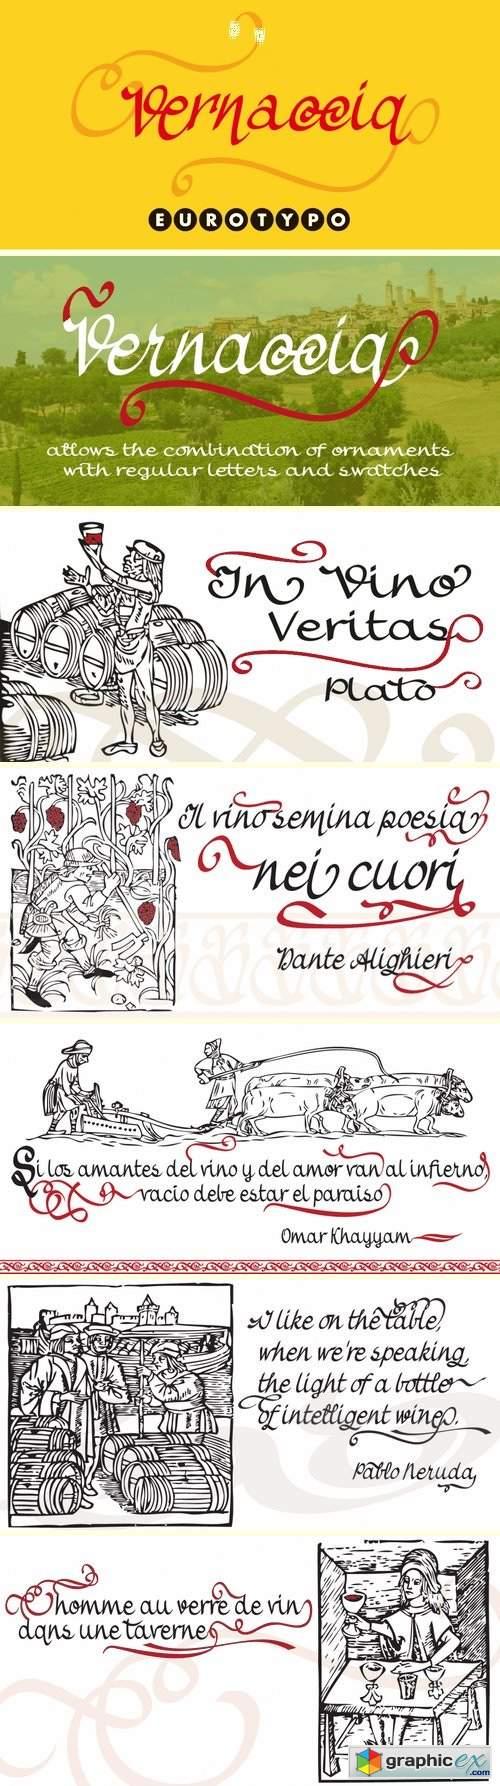 Vernaccia Font Family - 4 Fonts